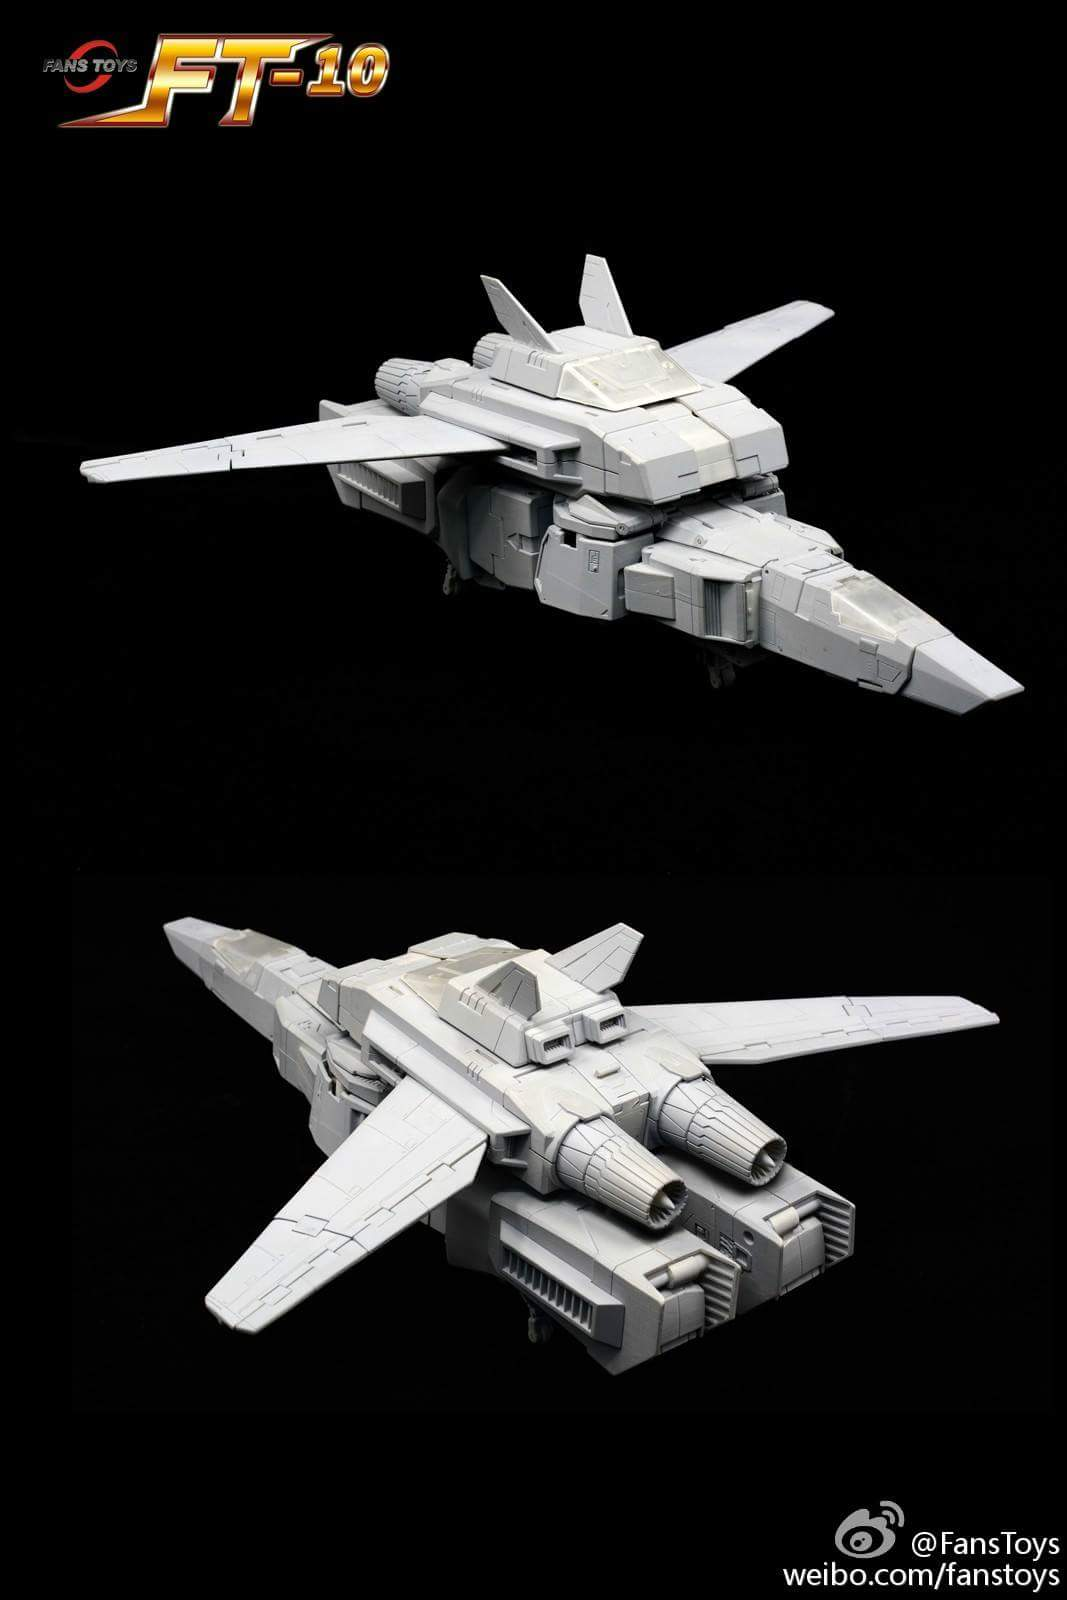 [Fanstoys] Produit Tiers - Jouet FT-10 Phoenix - aka Skyfire/Aérobo QjE03NlL